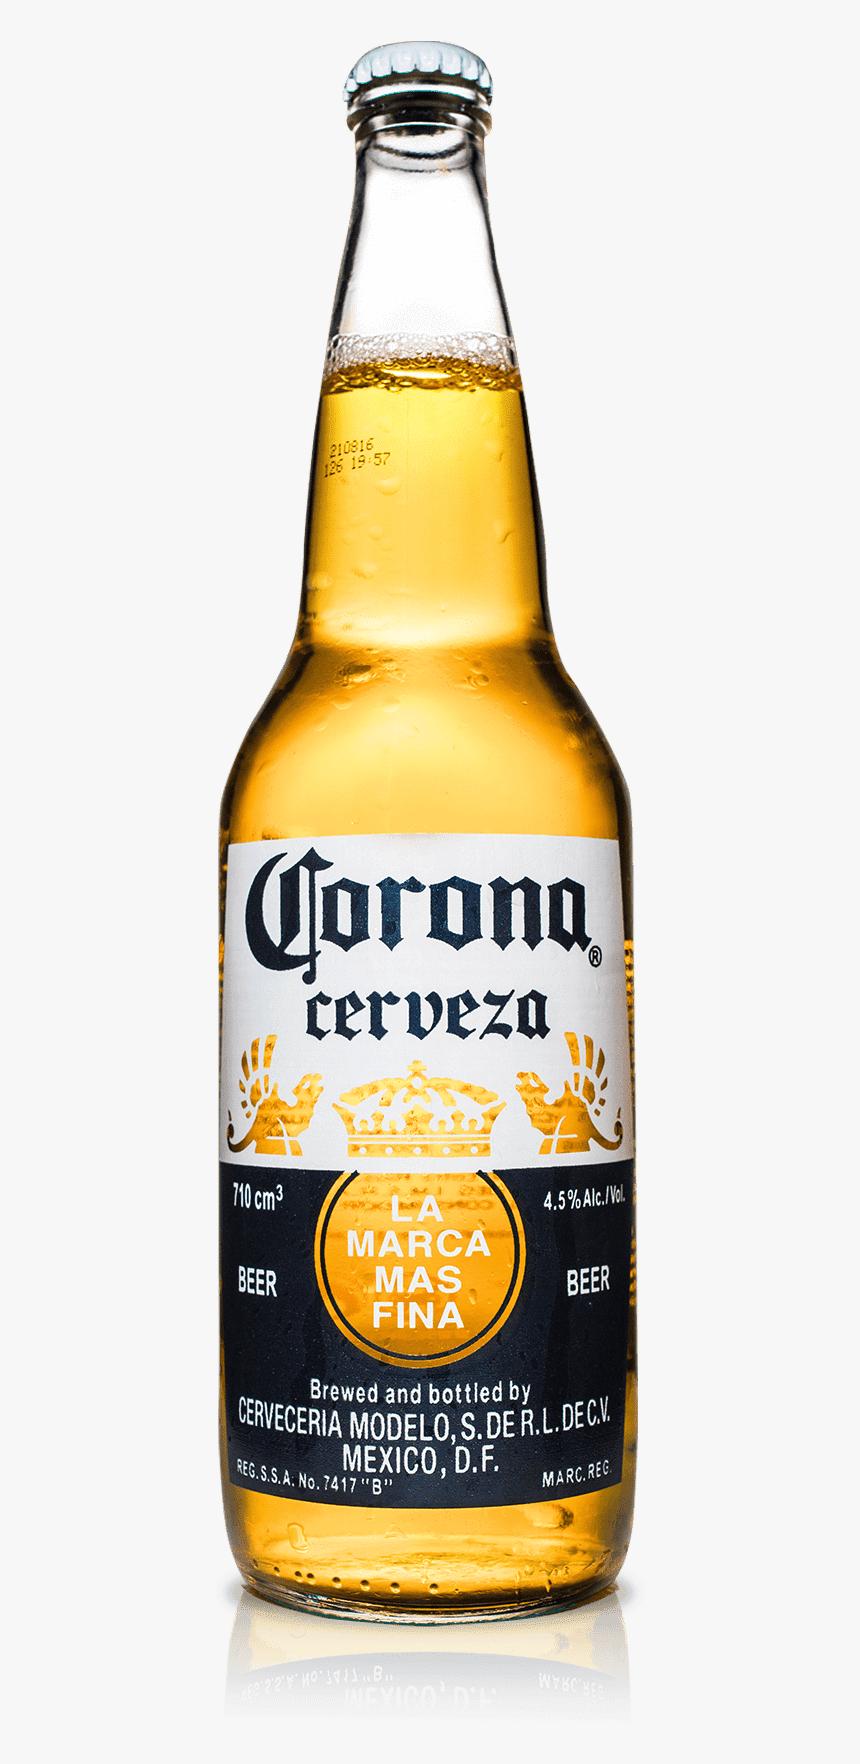 Corona Beer Bottle Png, Transparent Png, Free Download